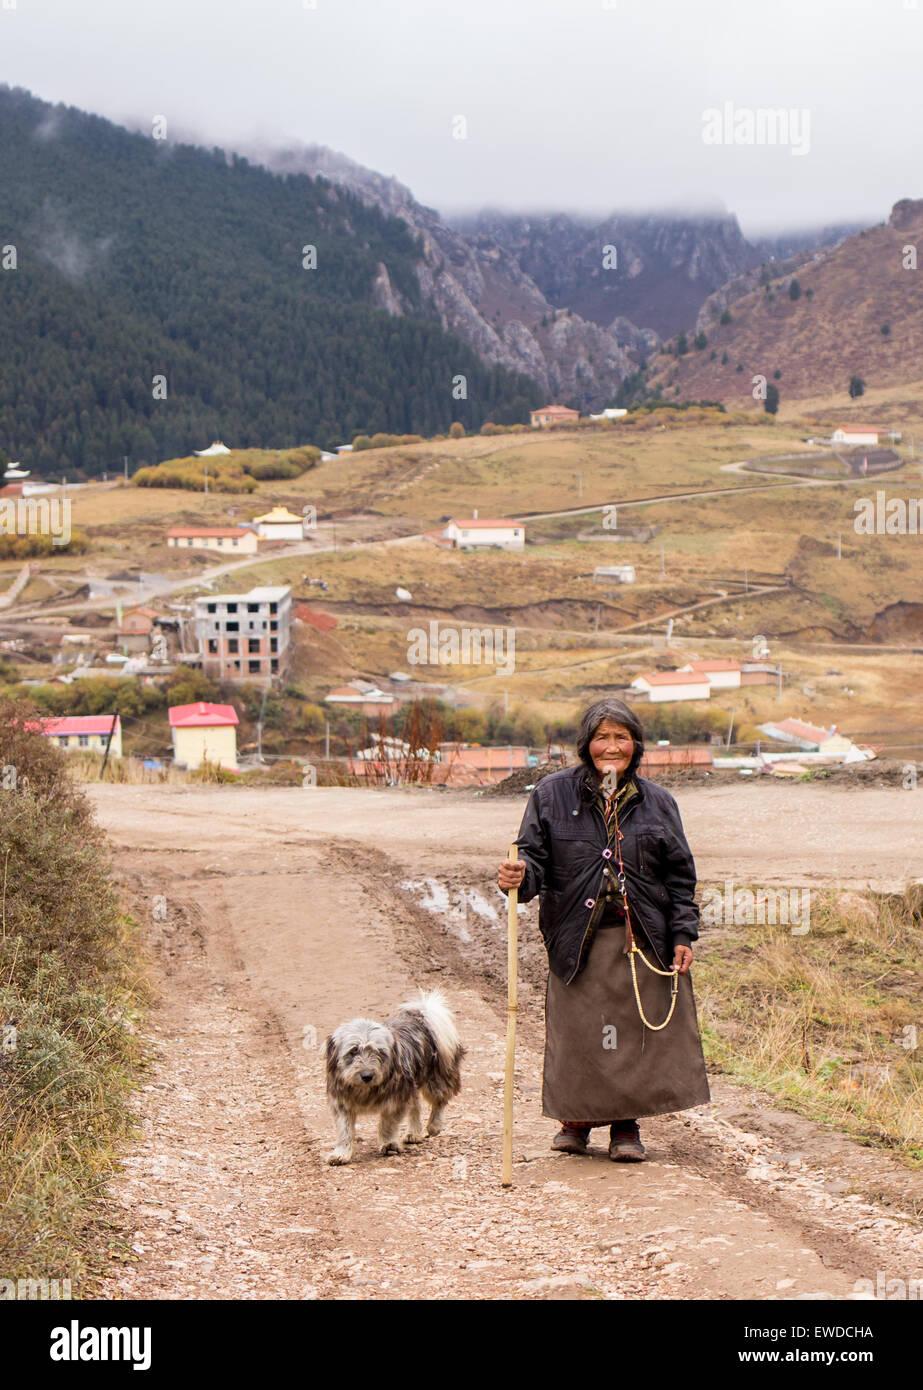 Tibet people who believe in Buddha - Stock Image